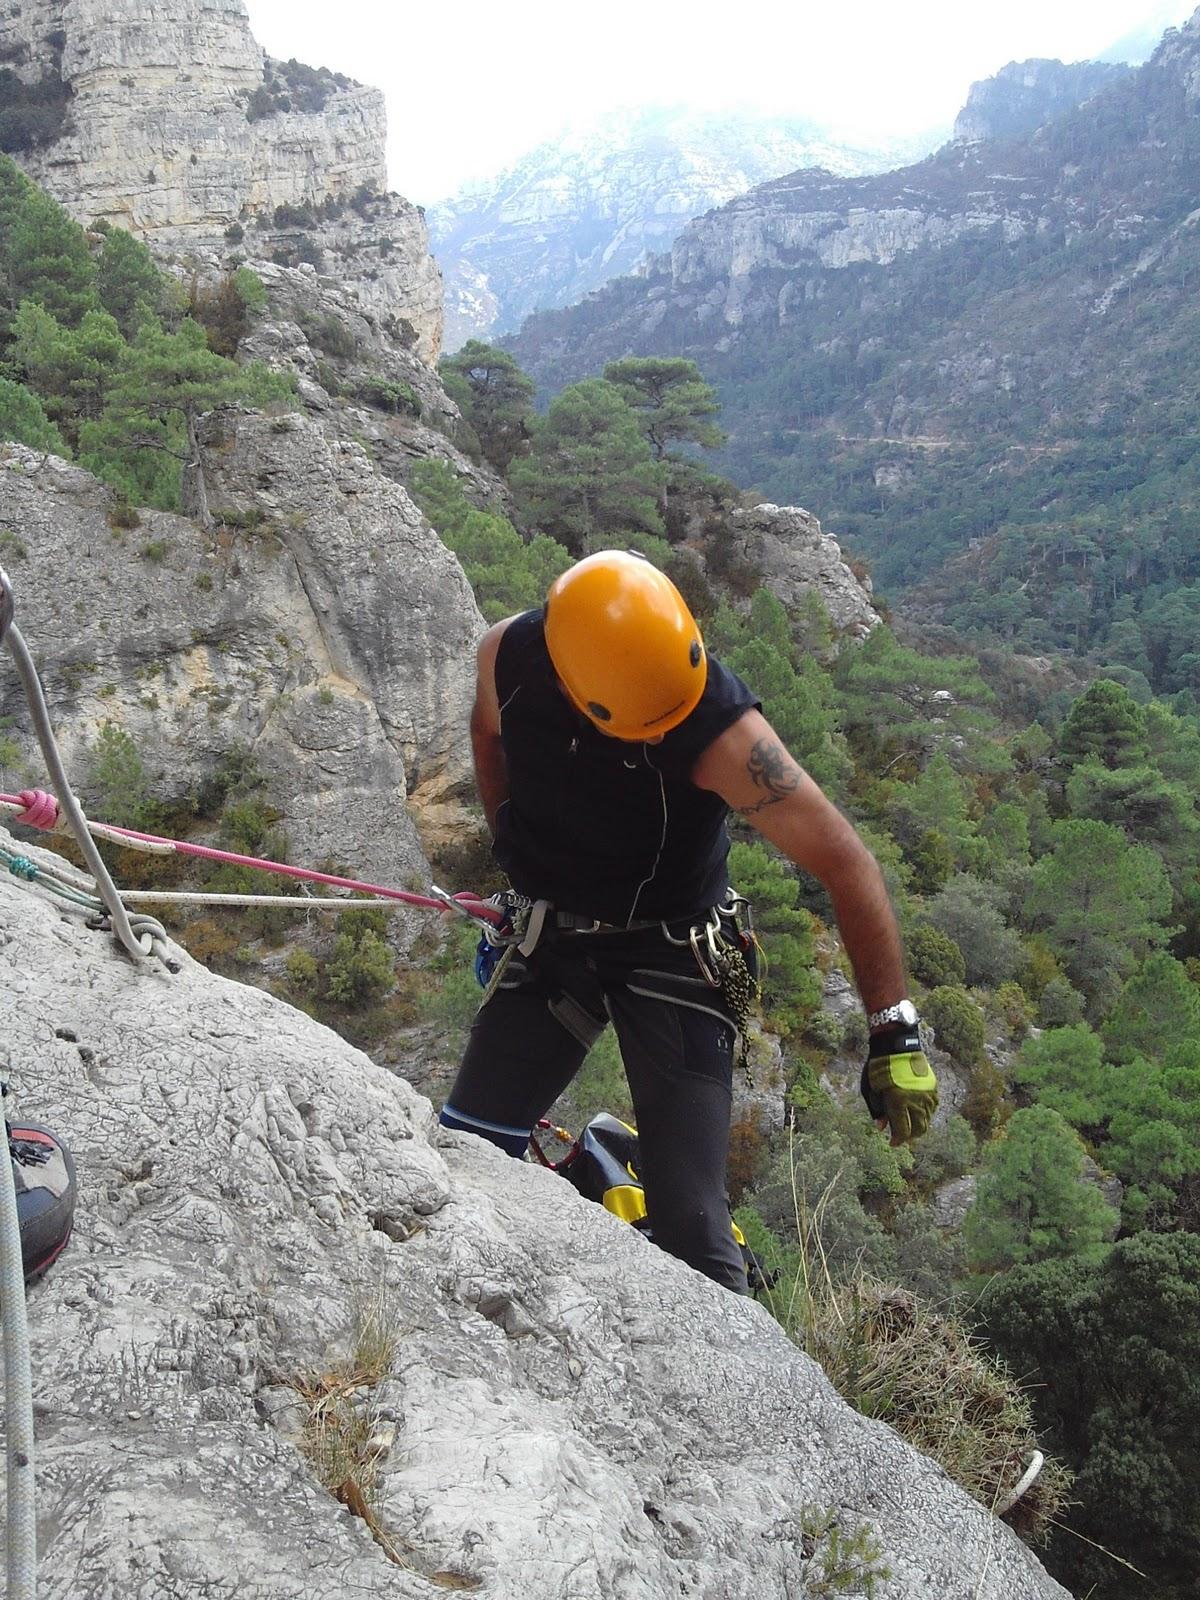 Associaci excursionista amposta coc fondo for Oficina de treball amposta